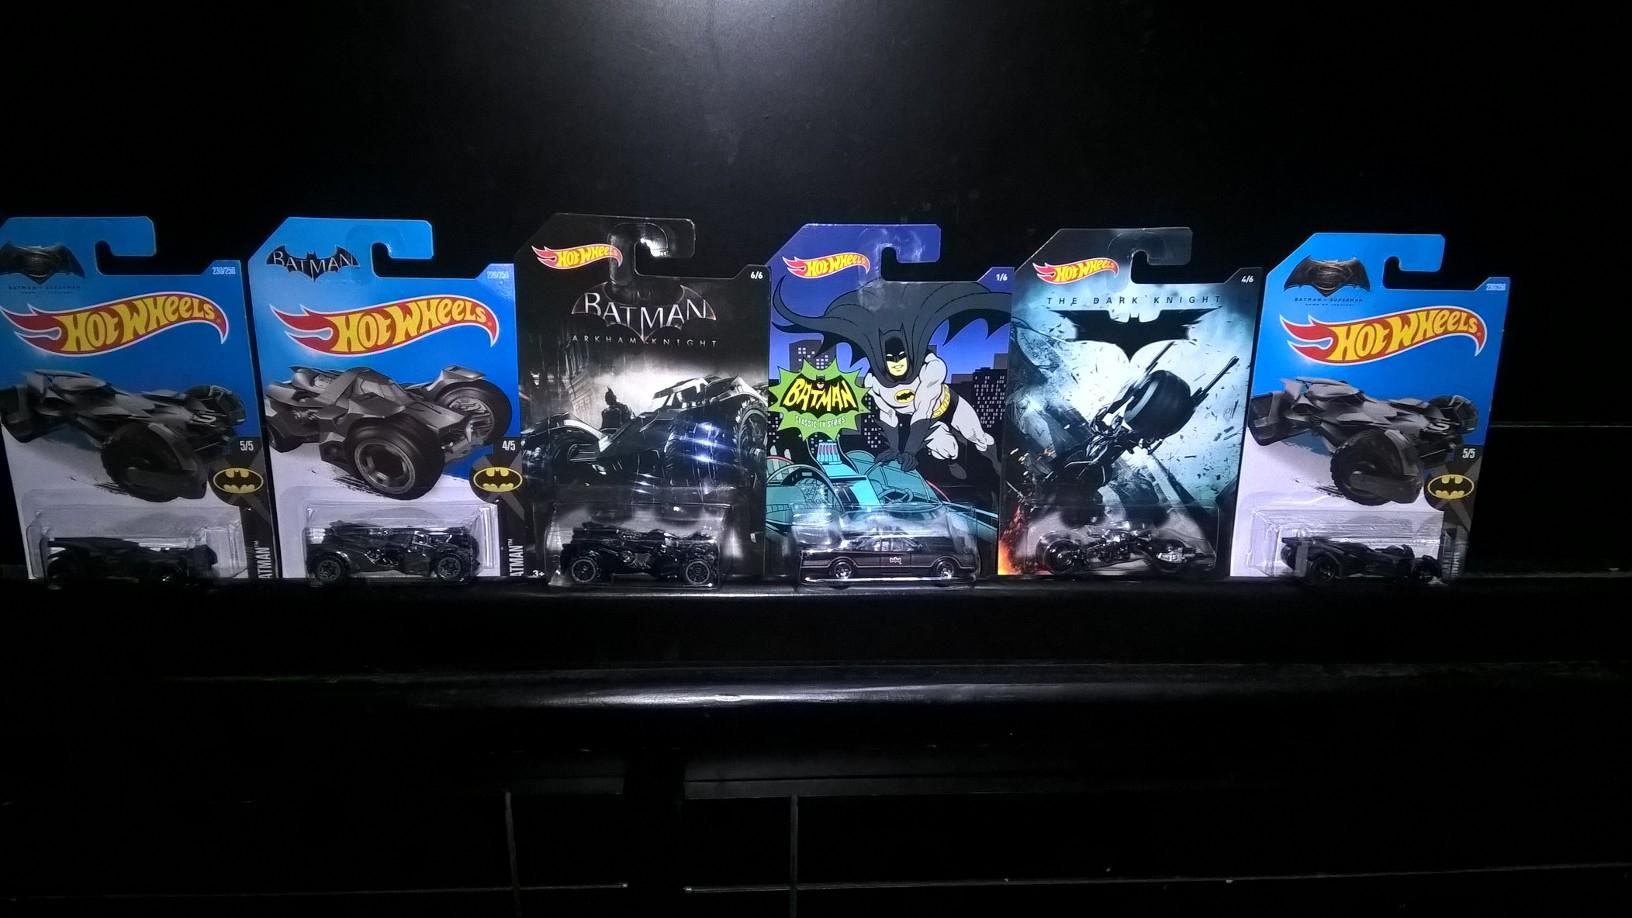 Bodega Aurrerá: carros Hot Wheels Batman a $17 y más